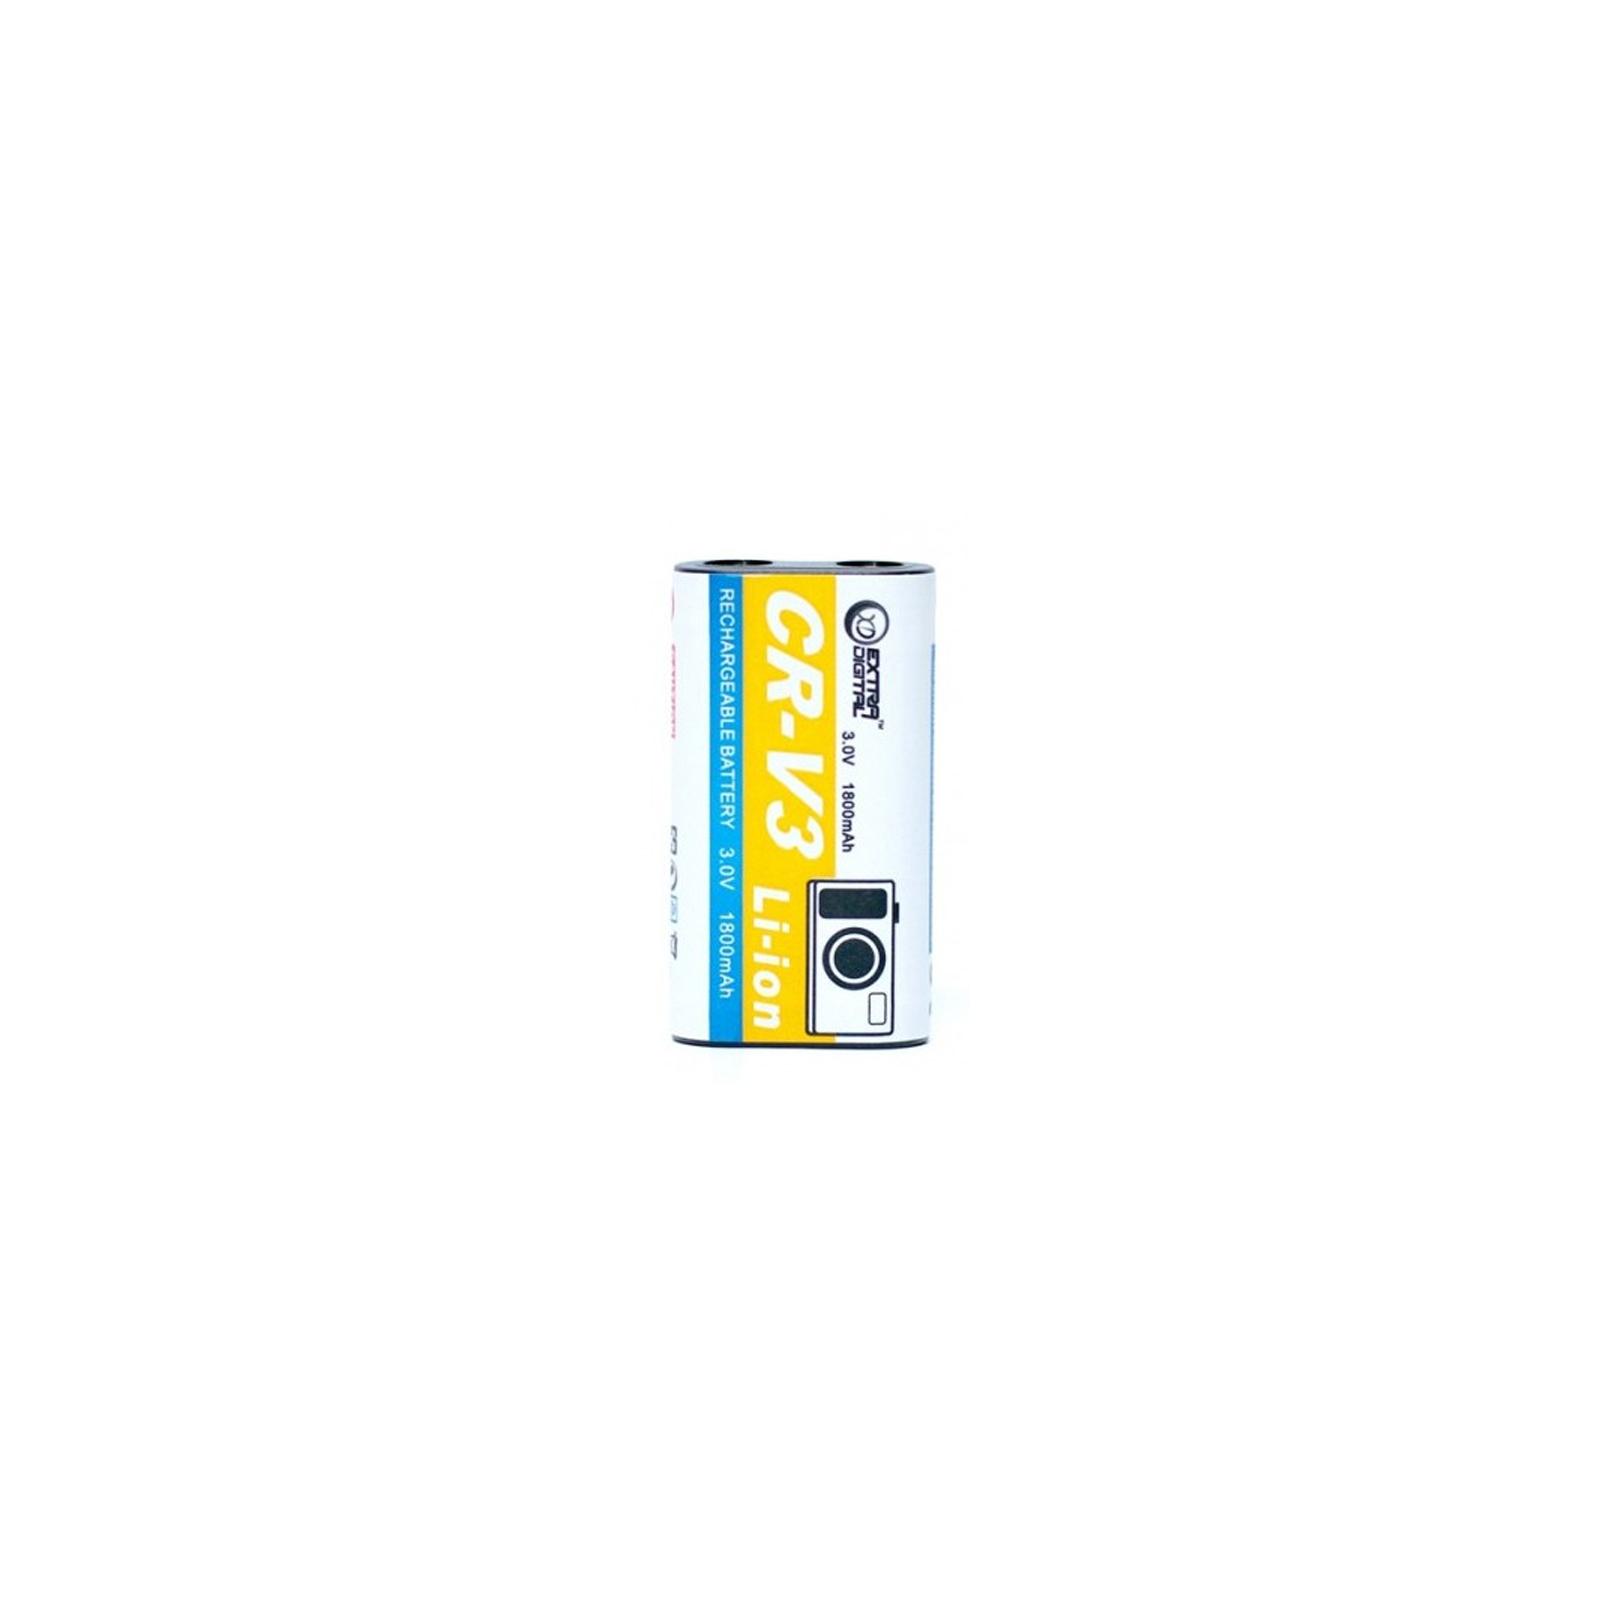 Аккумулятор к фото/видео EXTRADIGITAL Olympus LI-O1B (DV00DV1072)